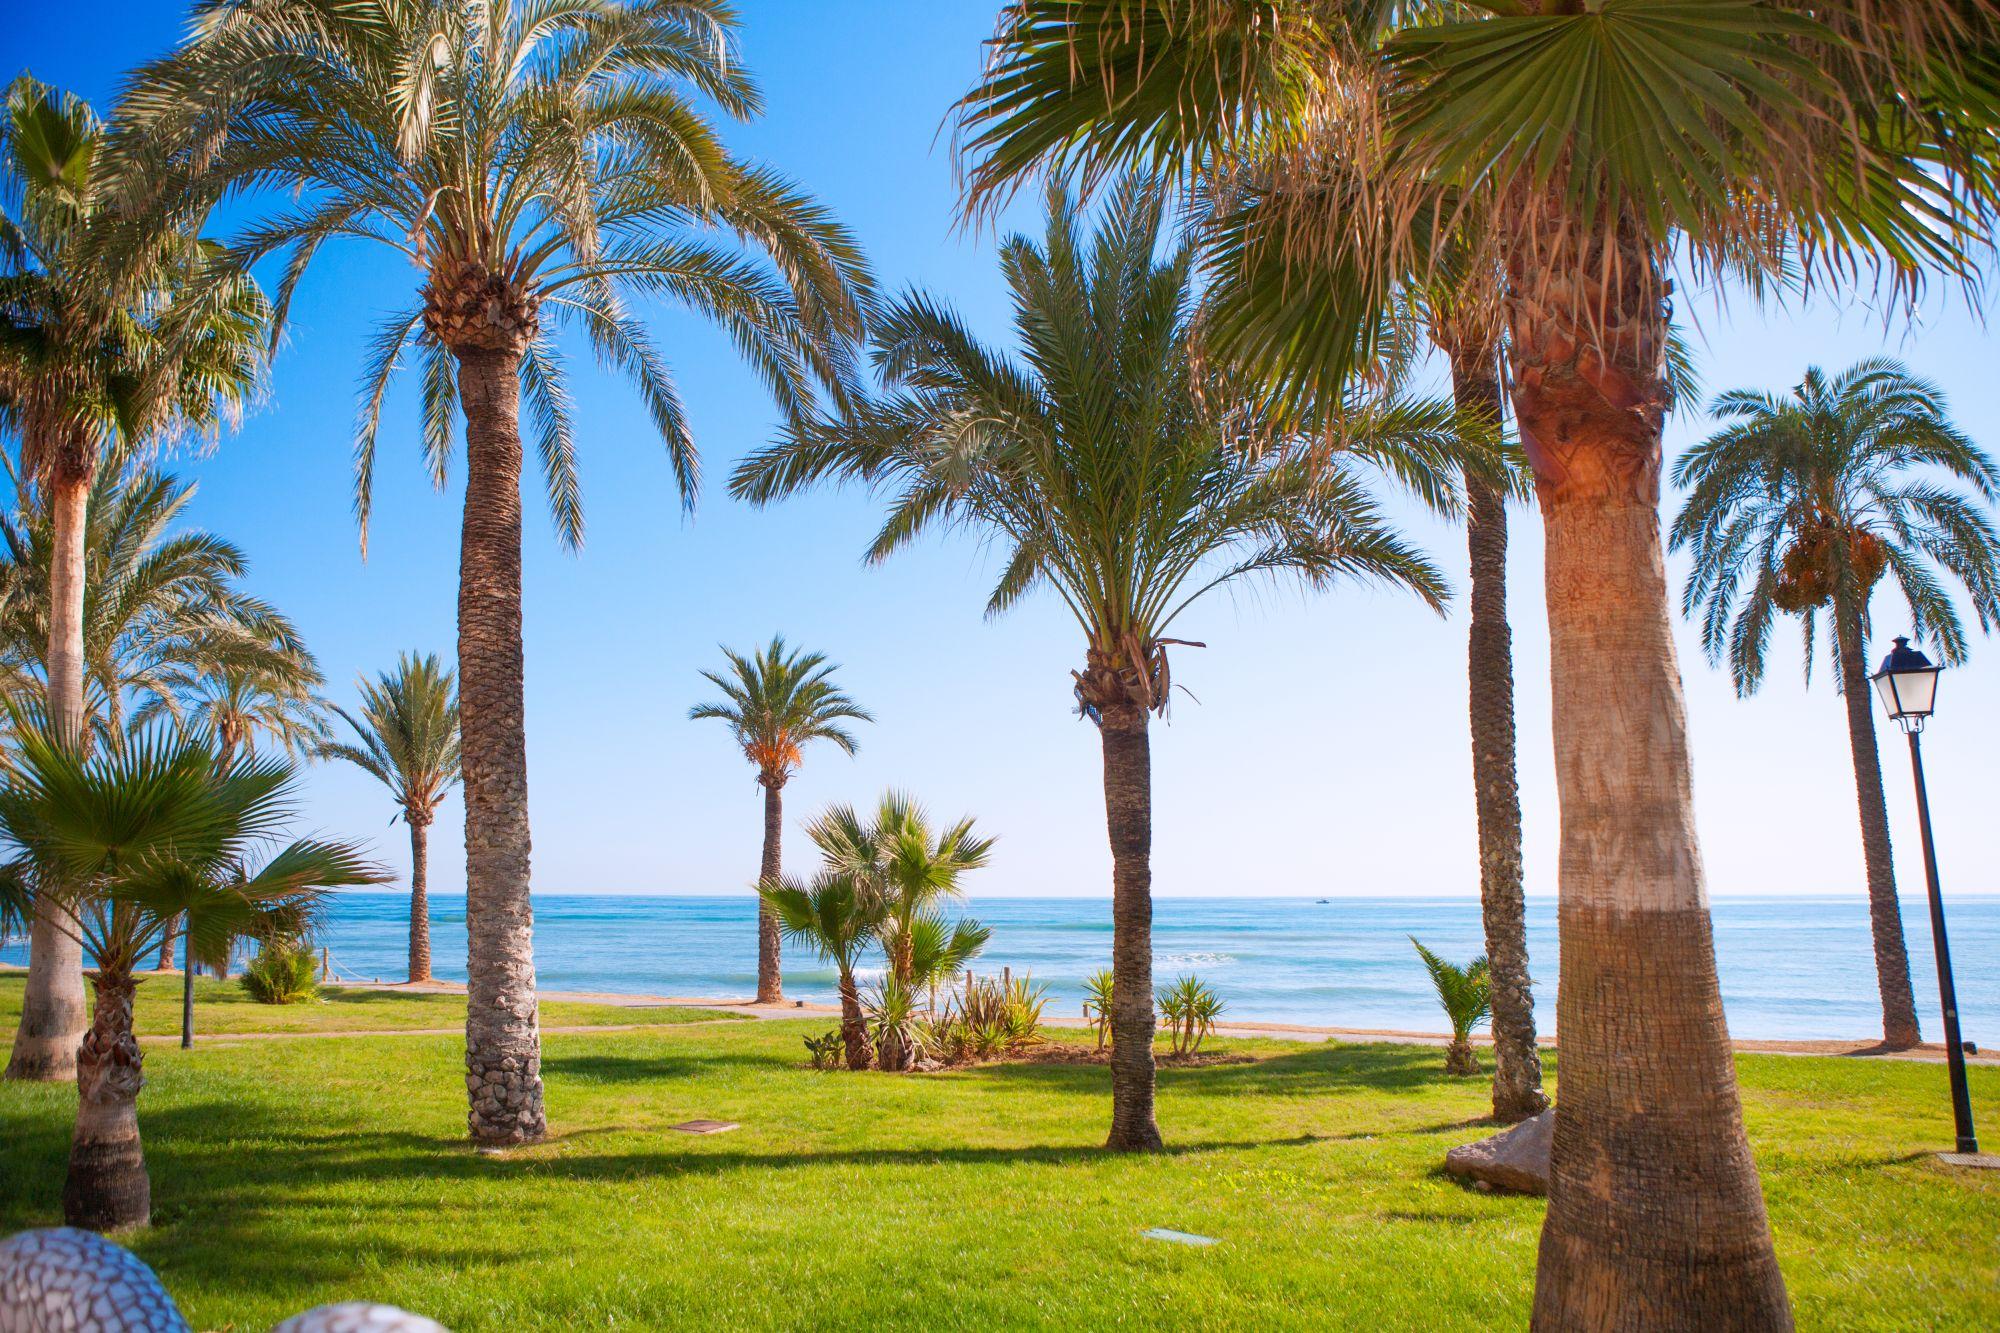 castellon widok plaży